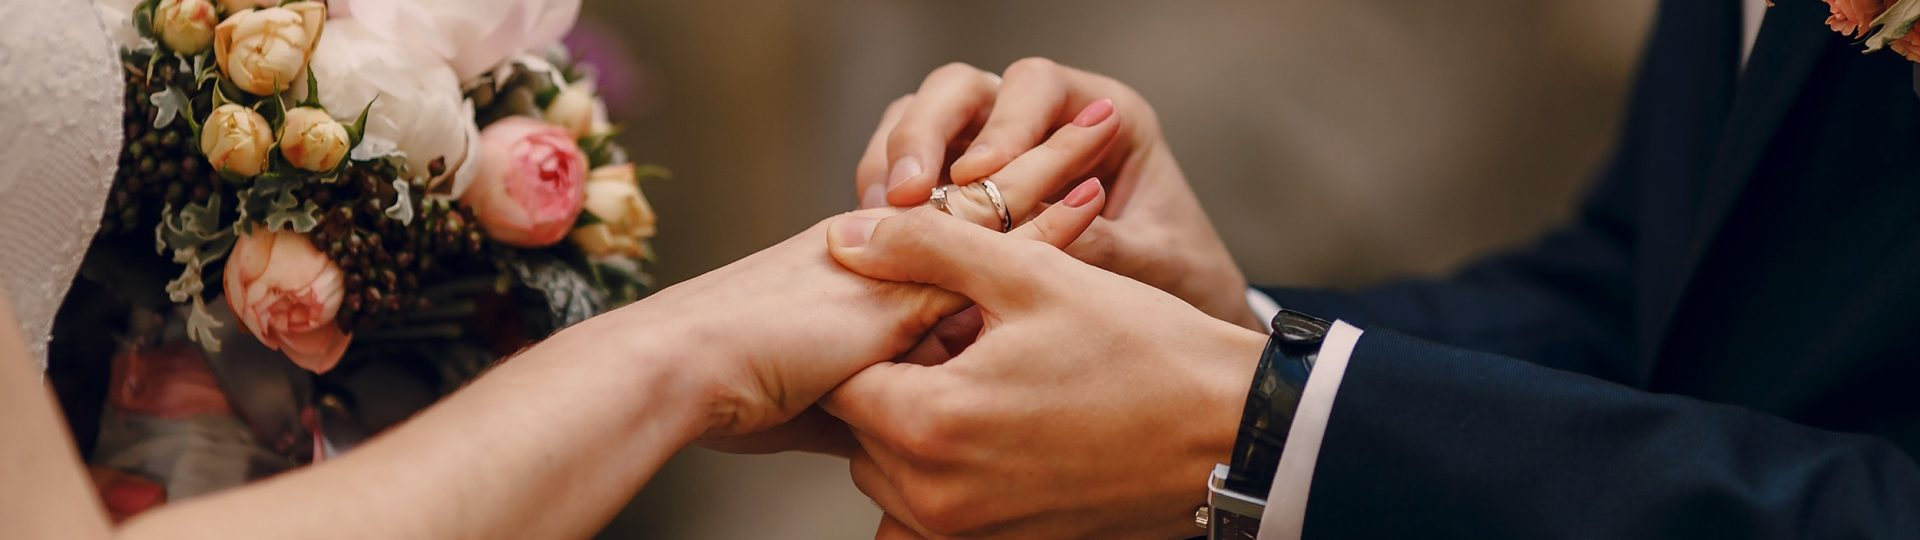 Matrimonio Catolico Tradicional : El matrimonio natural y sacramento